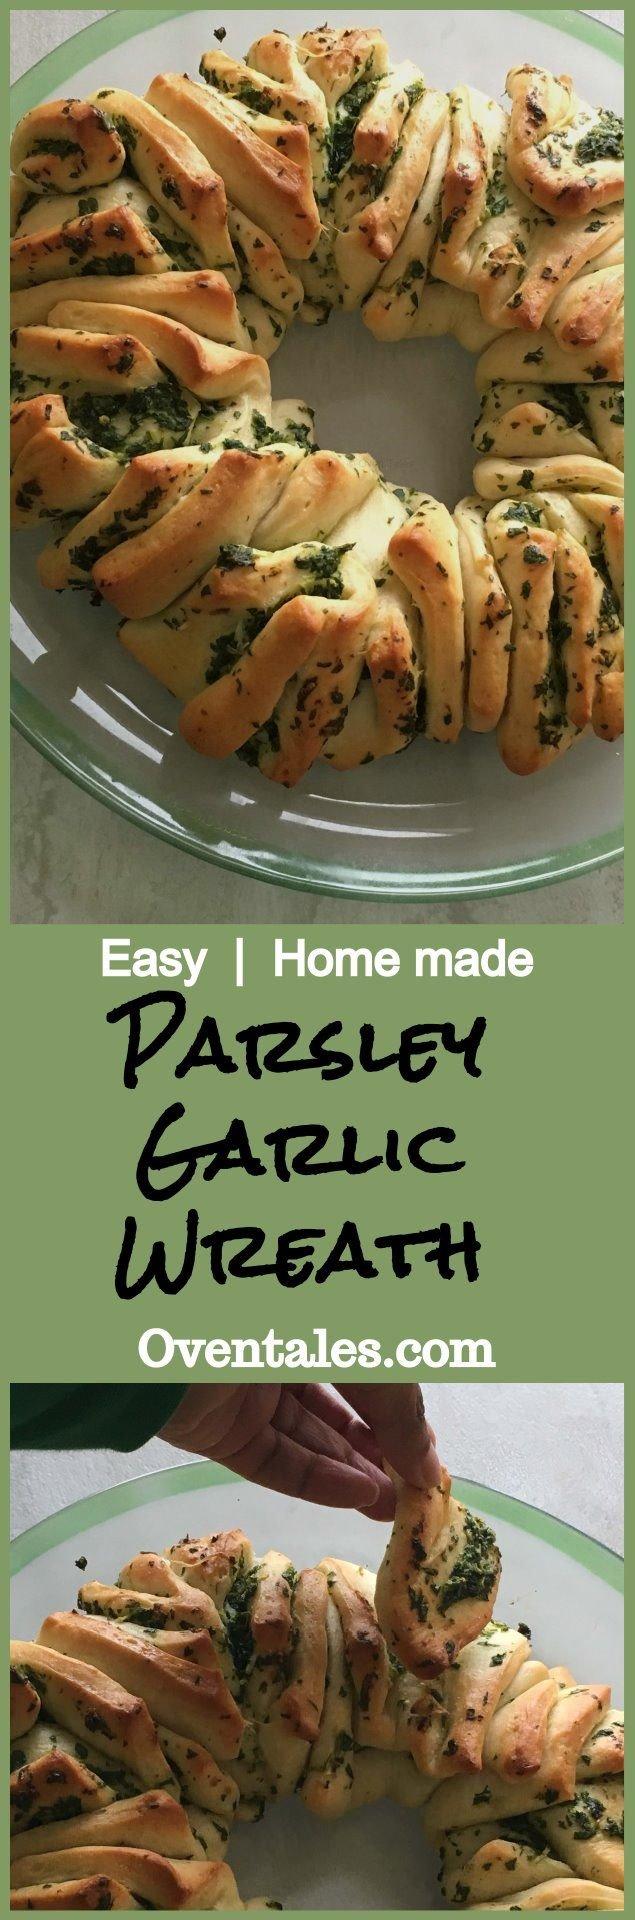 https://oventales.com/wp-content/uploads/2017/07/Parsley-Garlic-Wreath-Bread.jpg